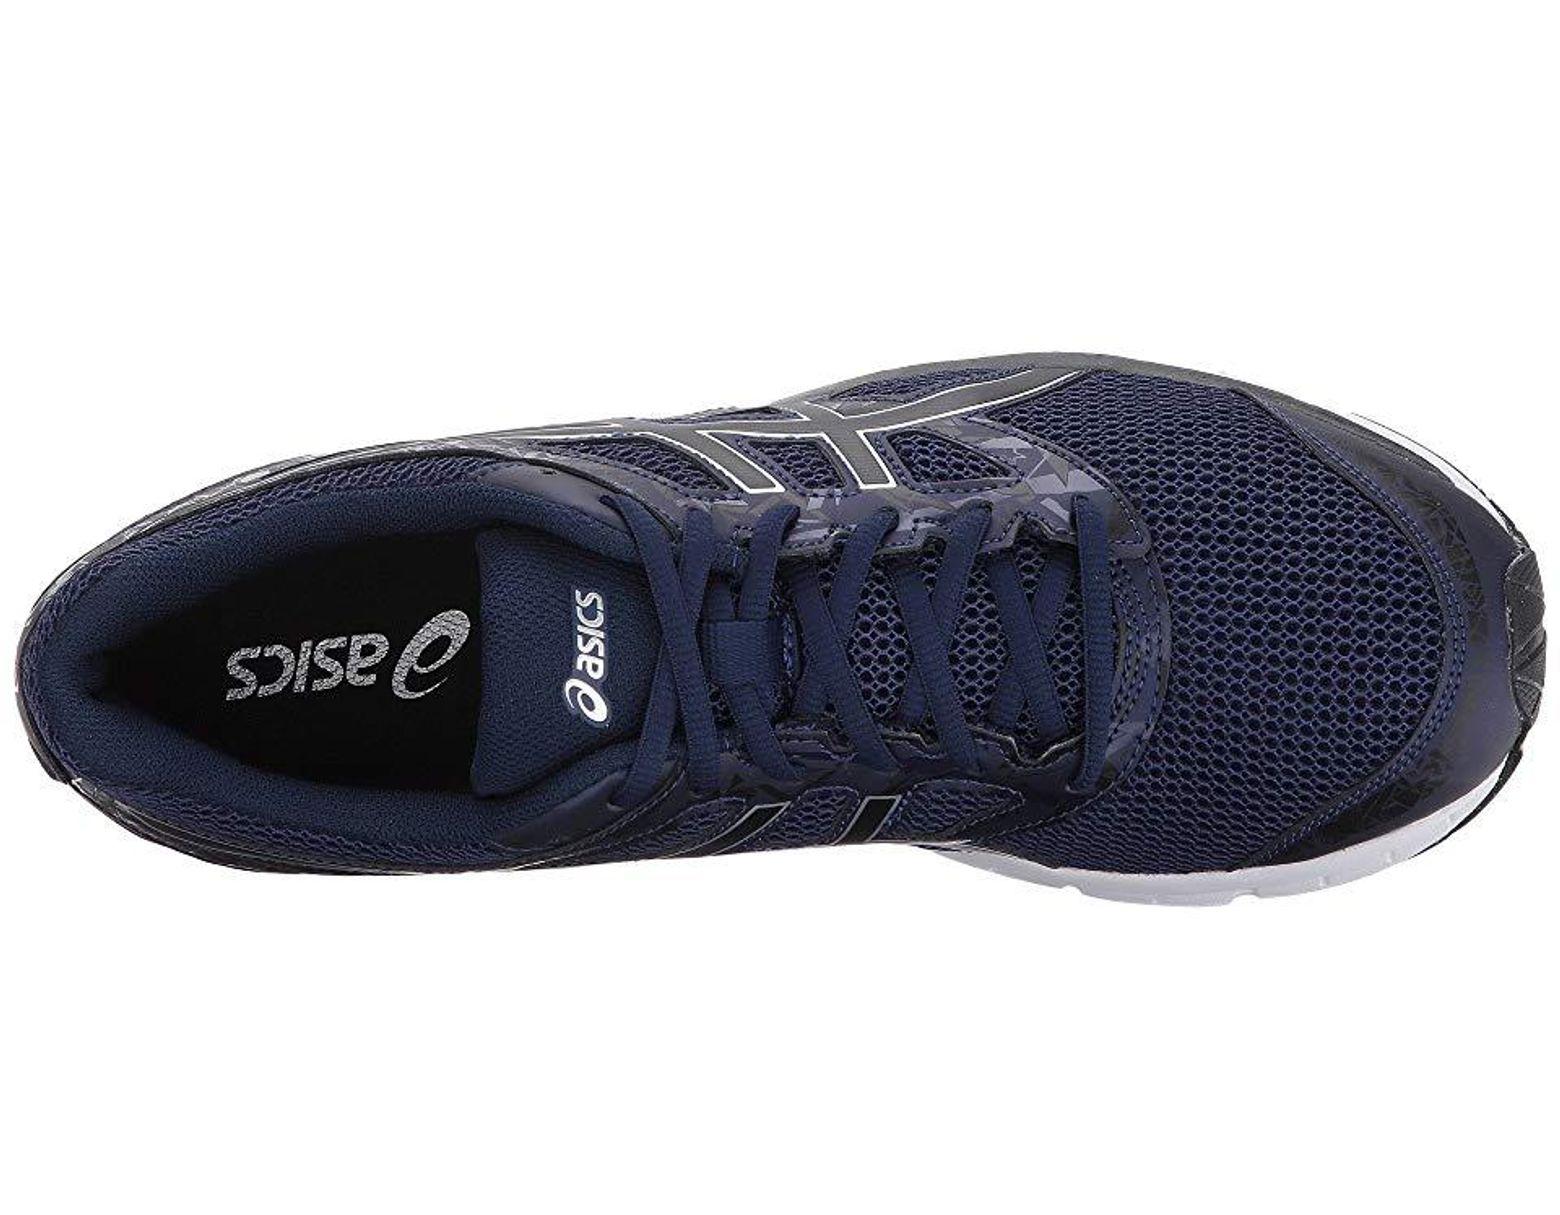 Men's Gel excite(r) 4 (indigo Blueblacksilver) Running Shoes